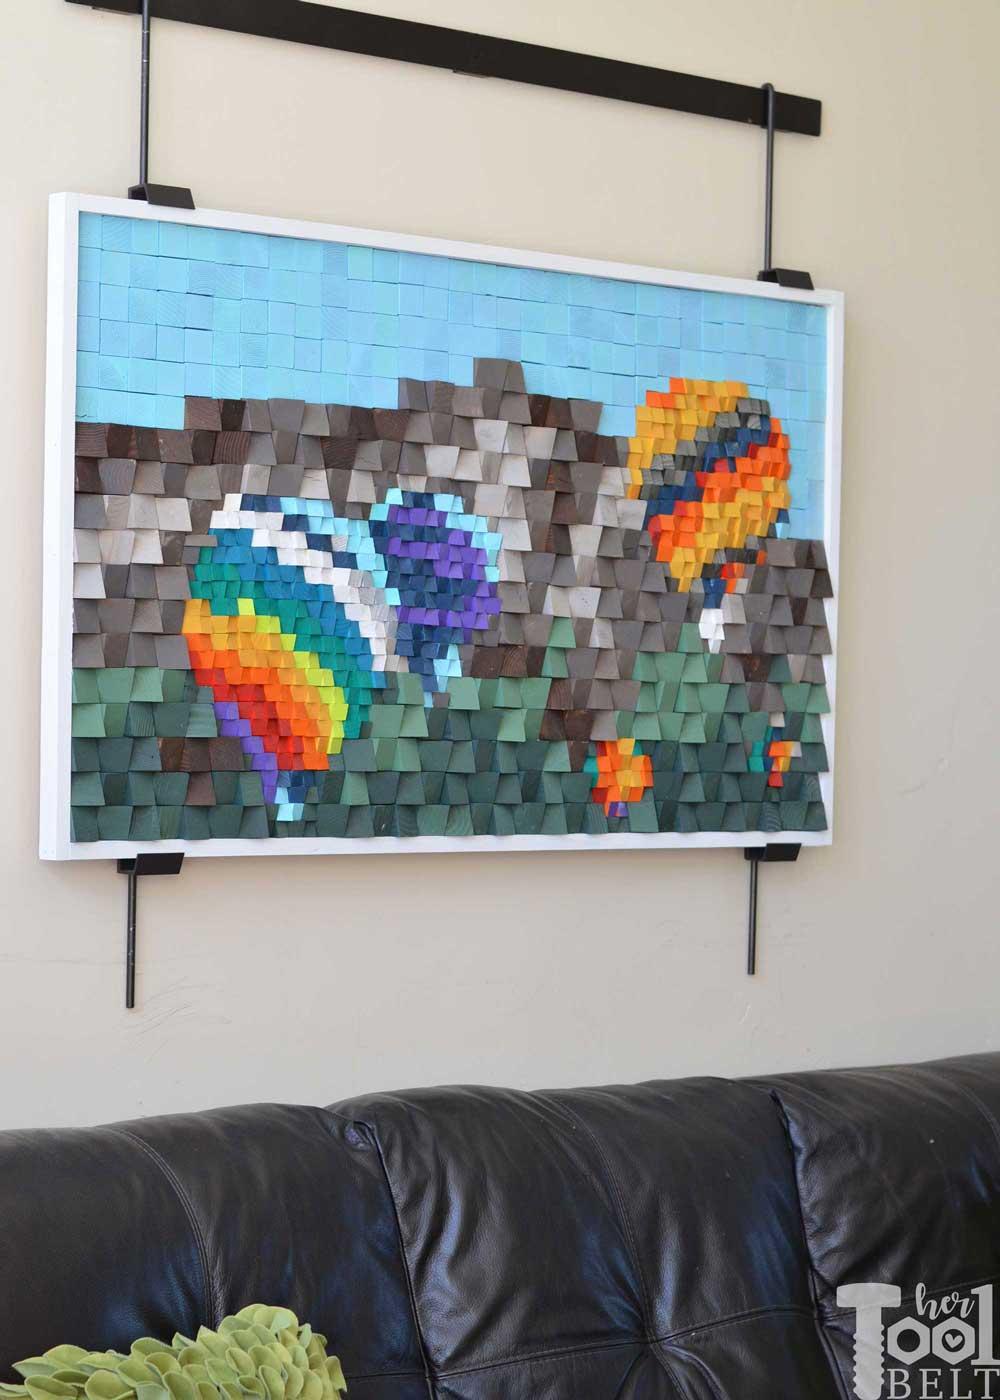 3D-wood-block-art-balloon-festival Pixel Art Painting @koolgadgetz.com.info